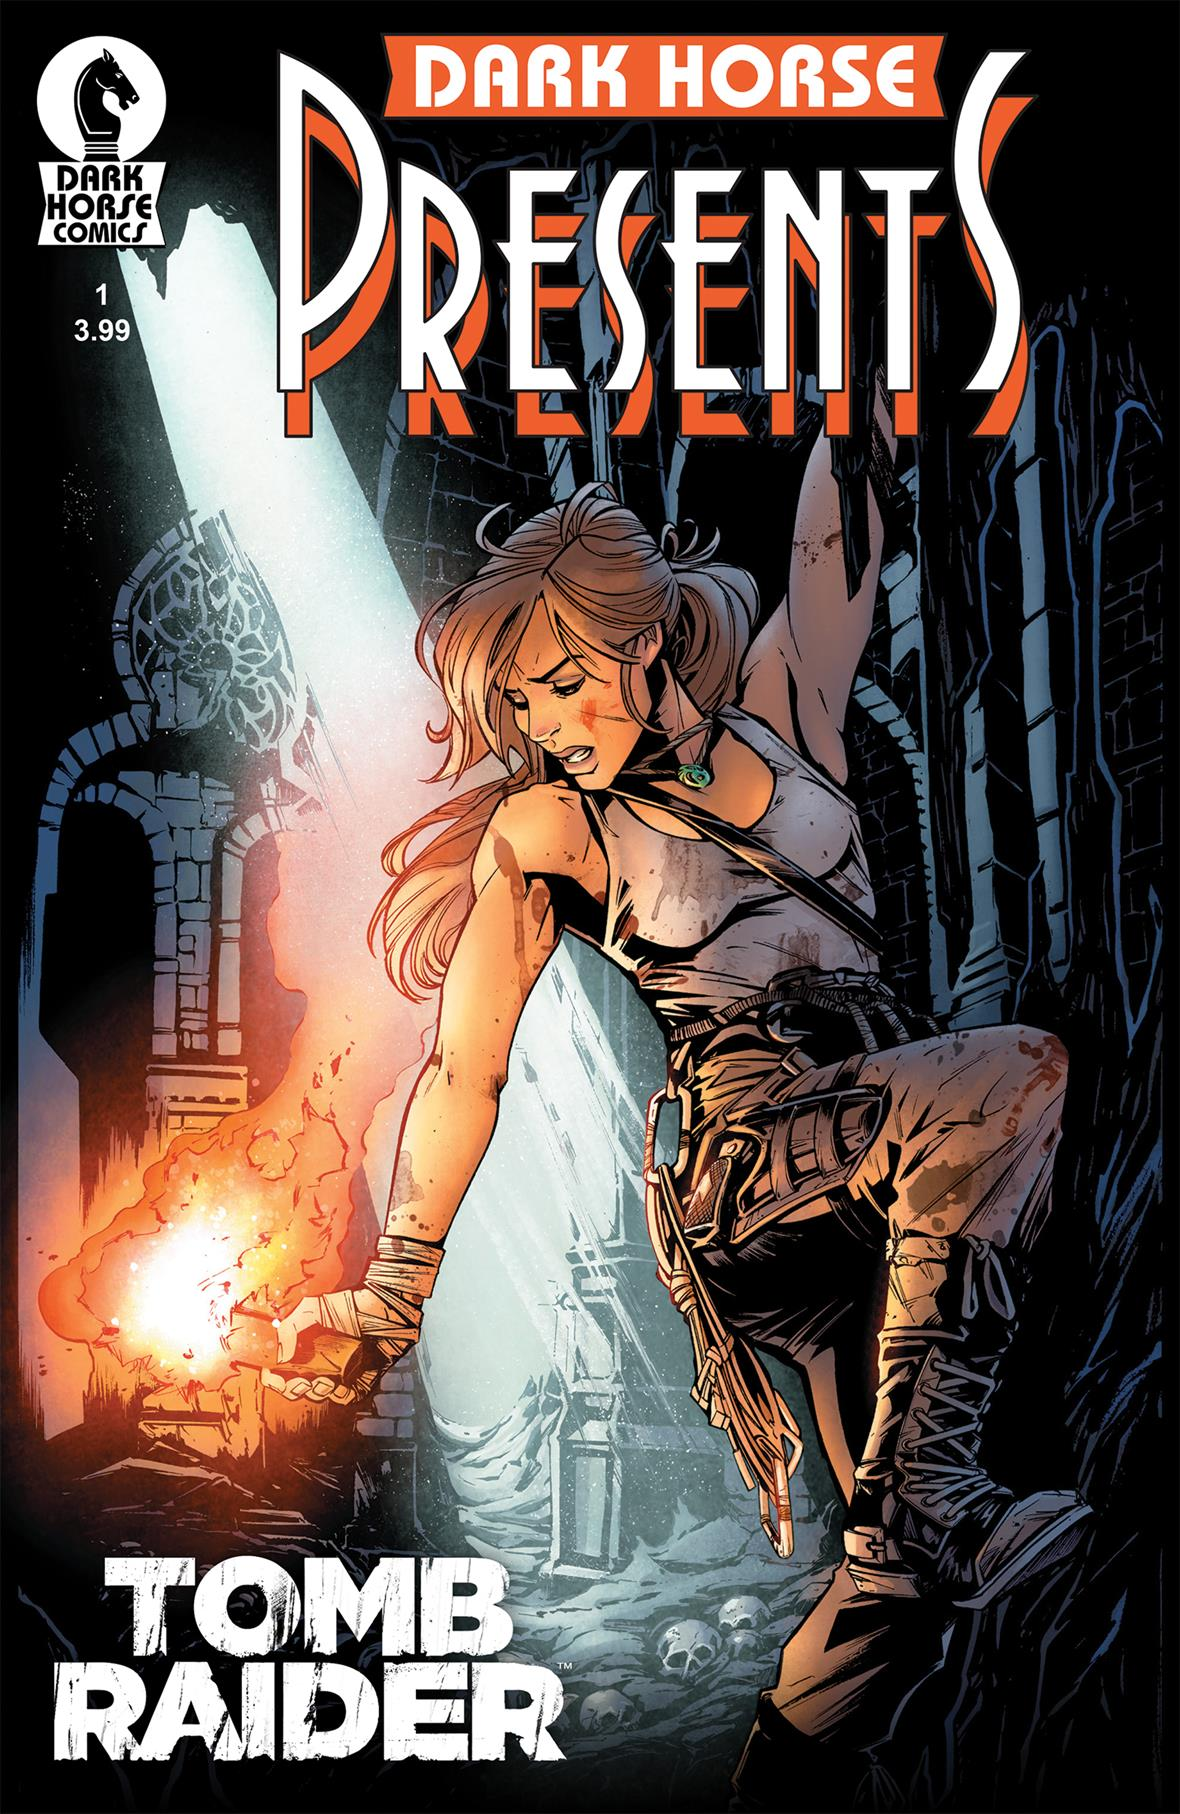 Tomb Raider #1 Cover